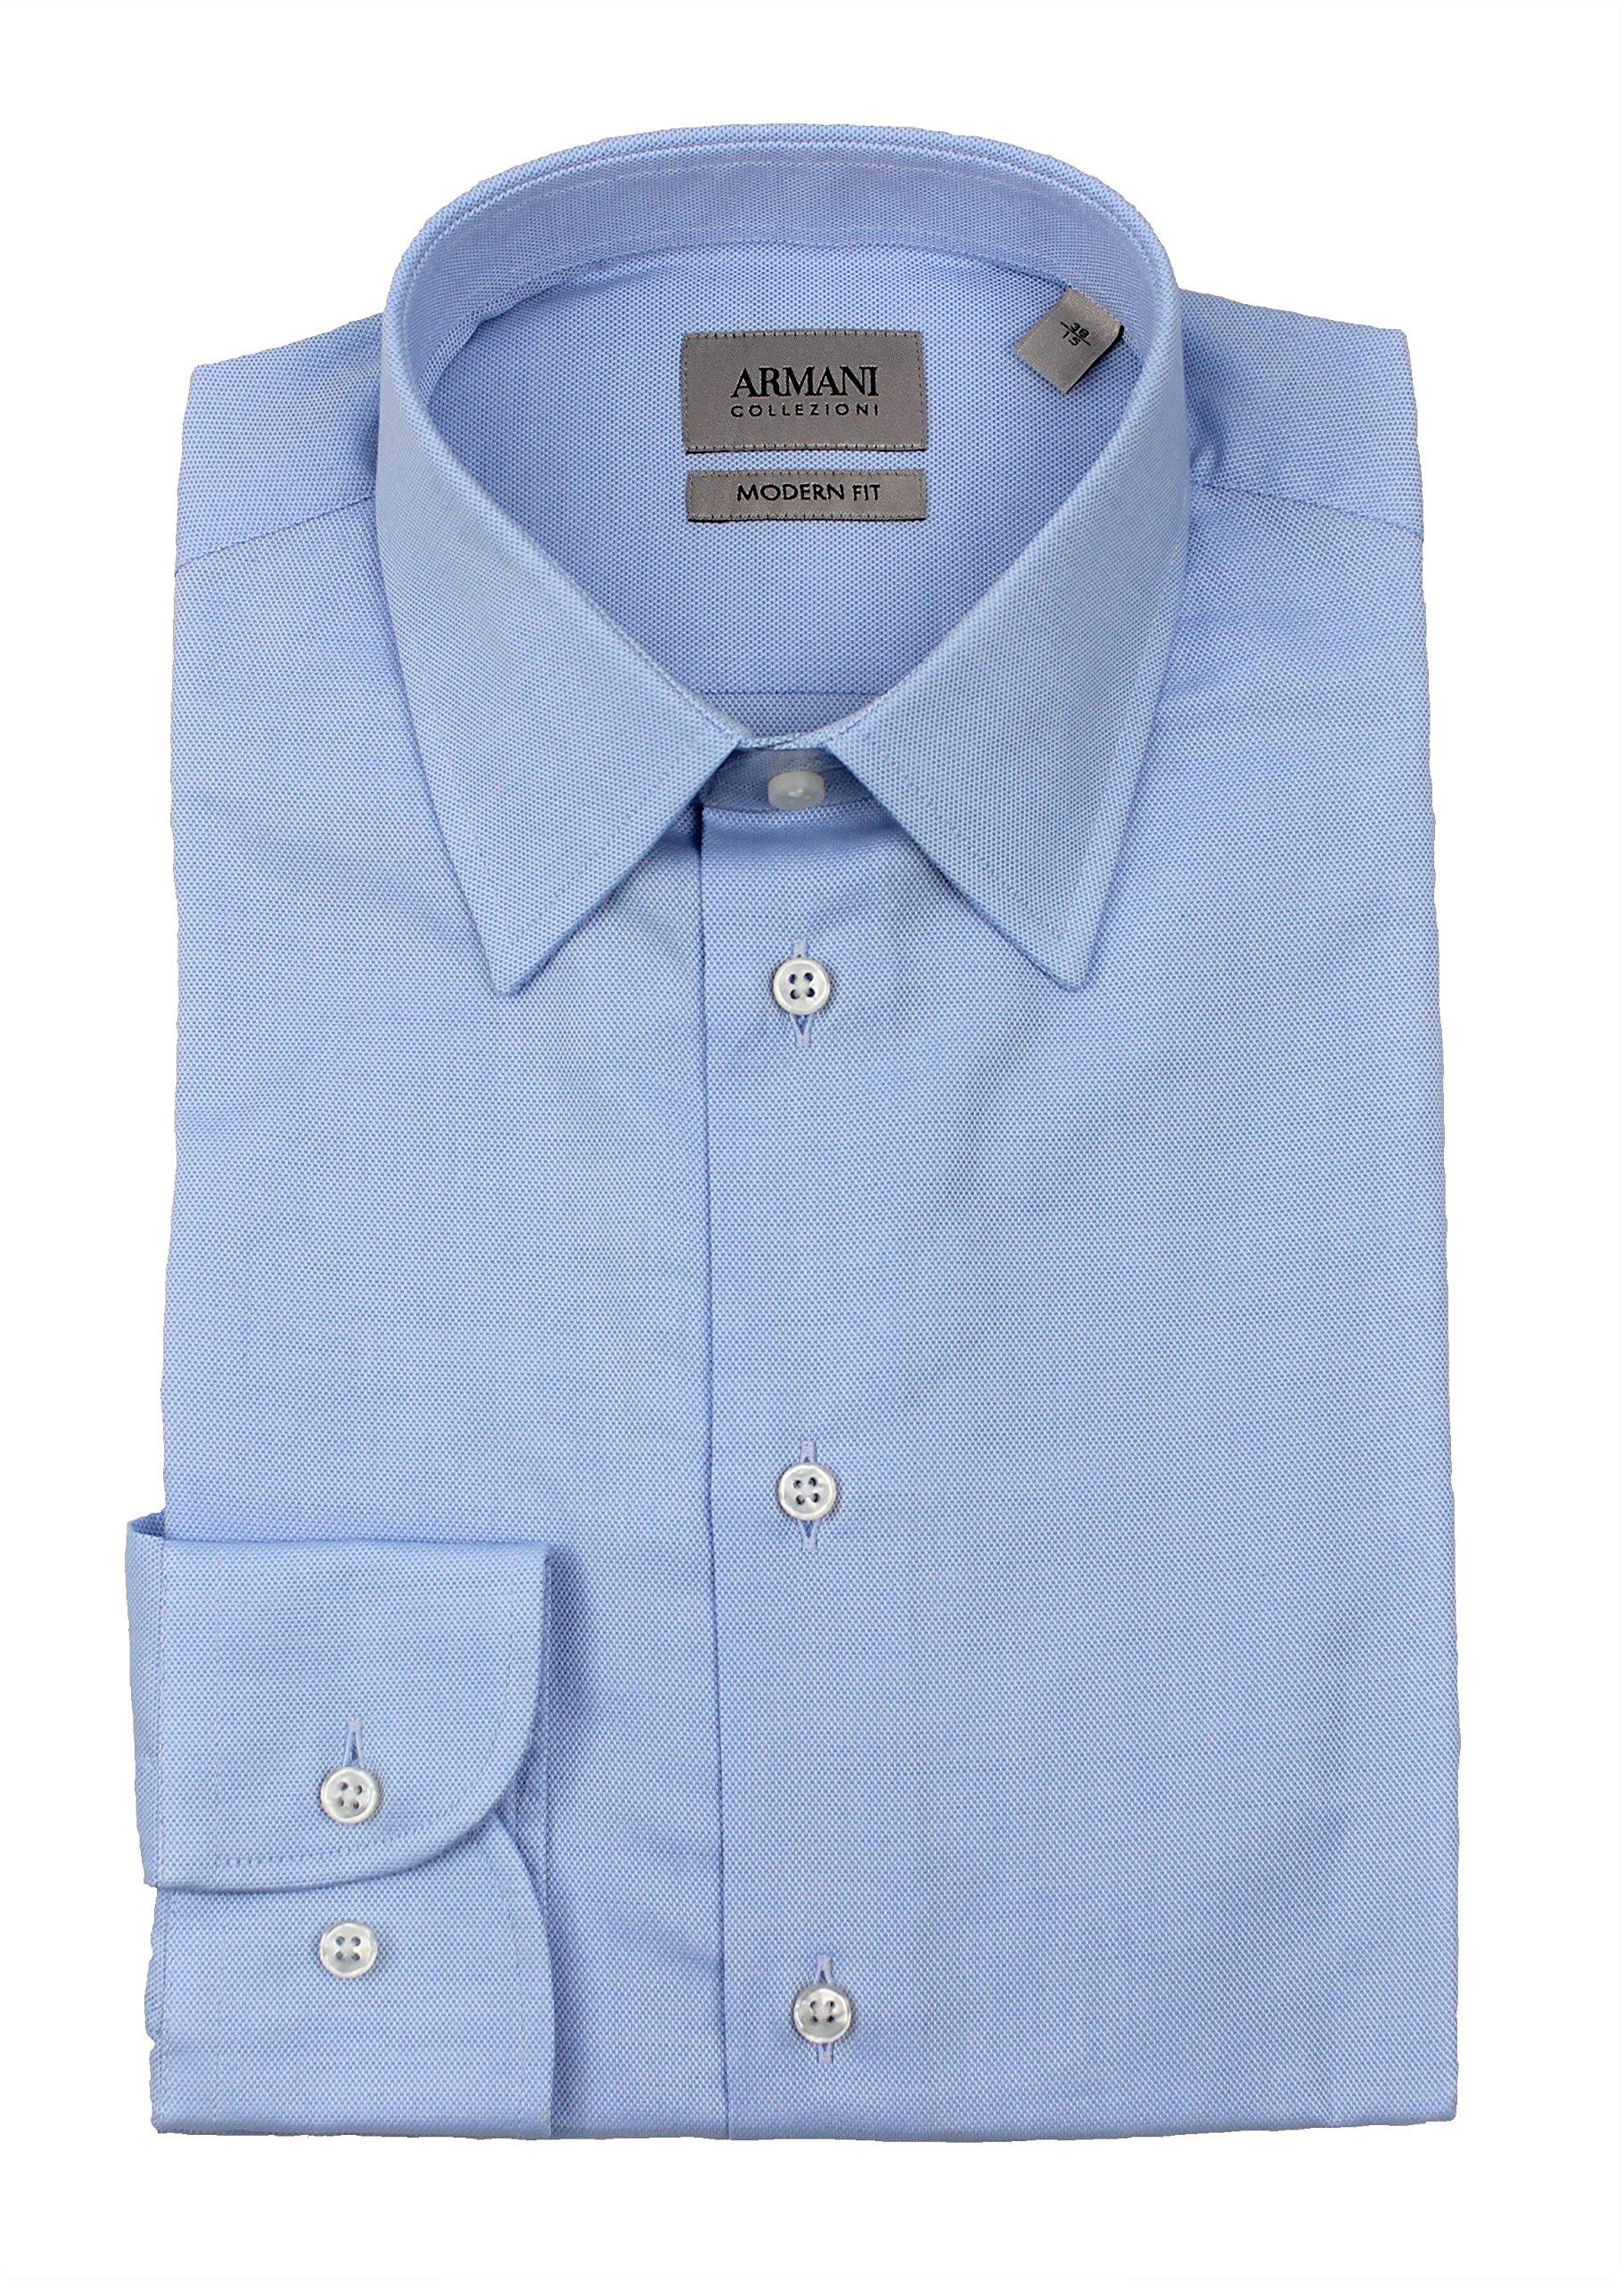 Armani Collezioni Men's Cotton Dress Shirt Modern Fit Blue VCCM5L VC37C 700 (USA15.5/EURO39)